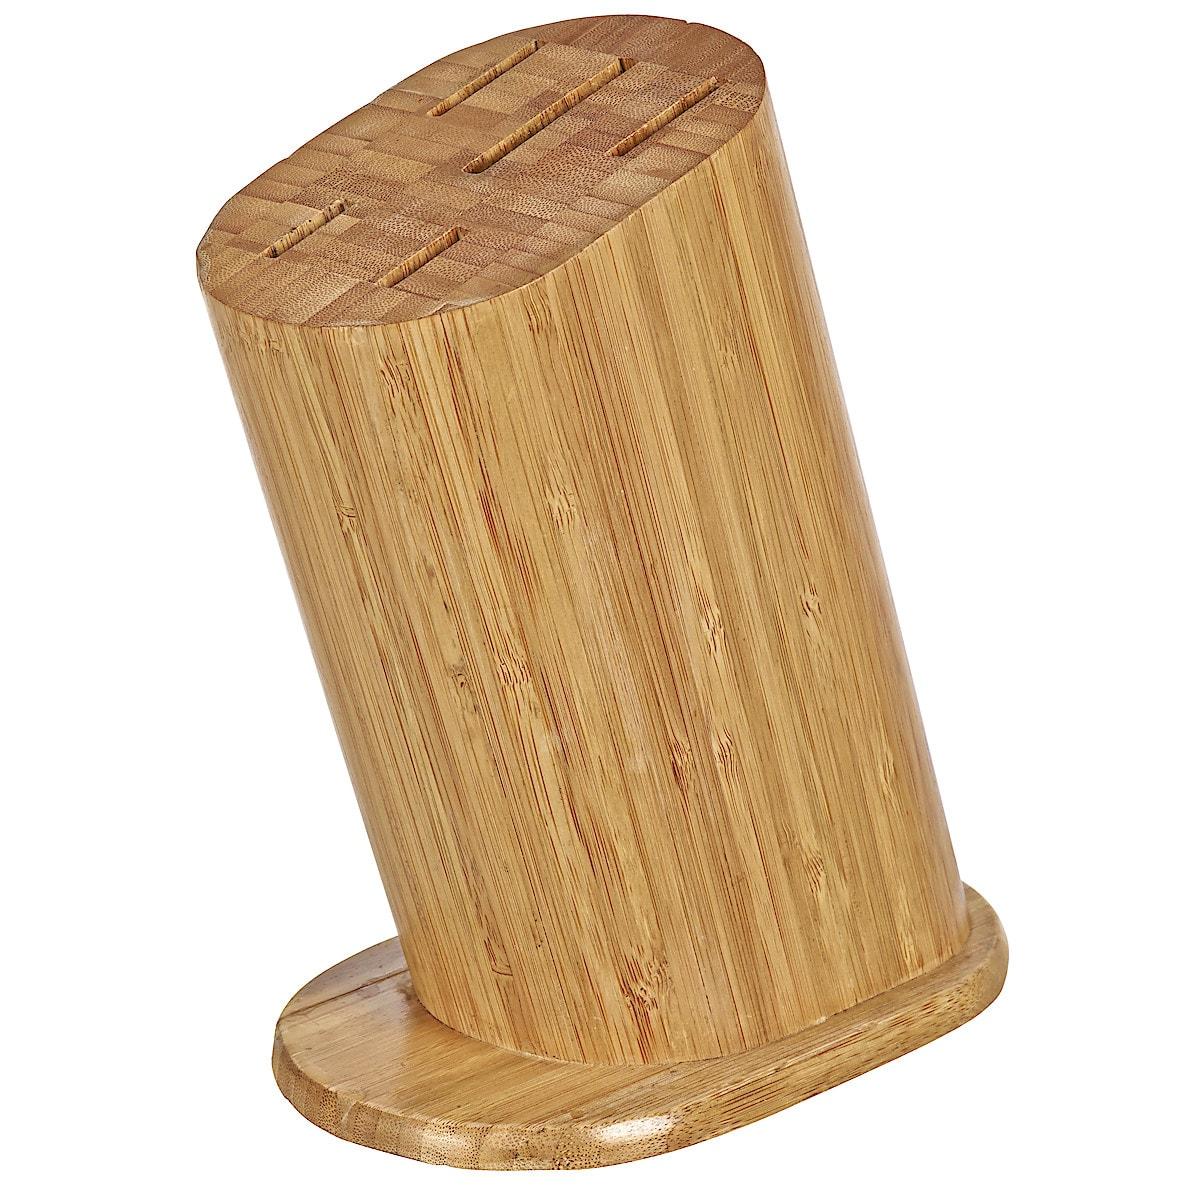 Messerblock aus Bambus